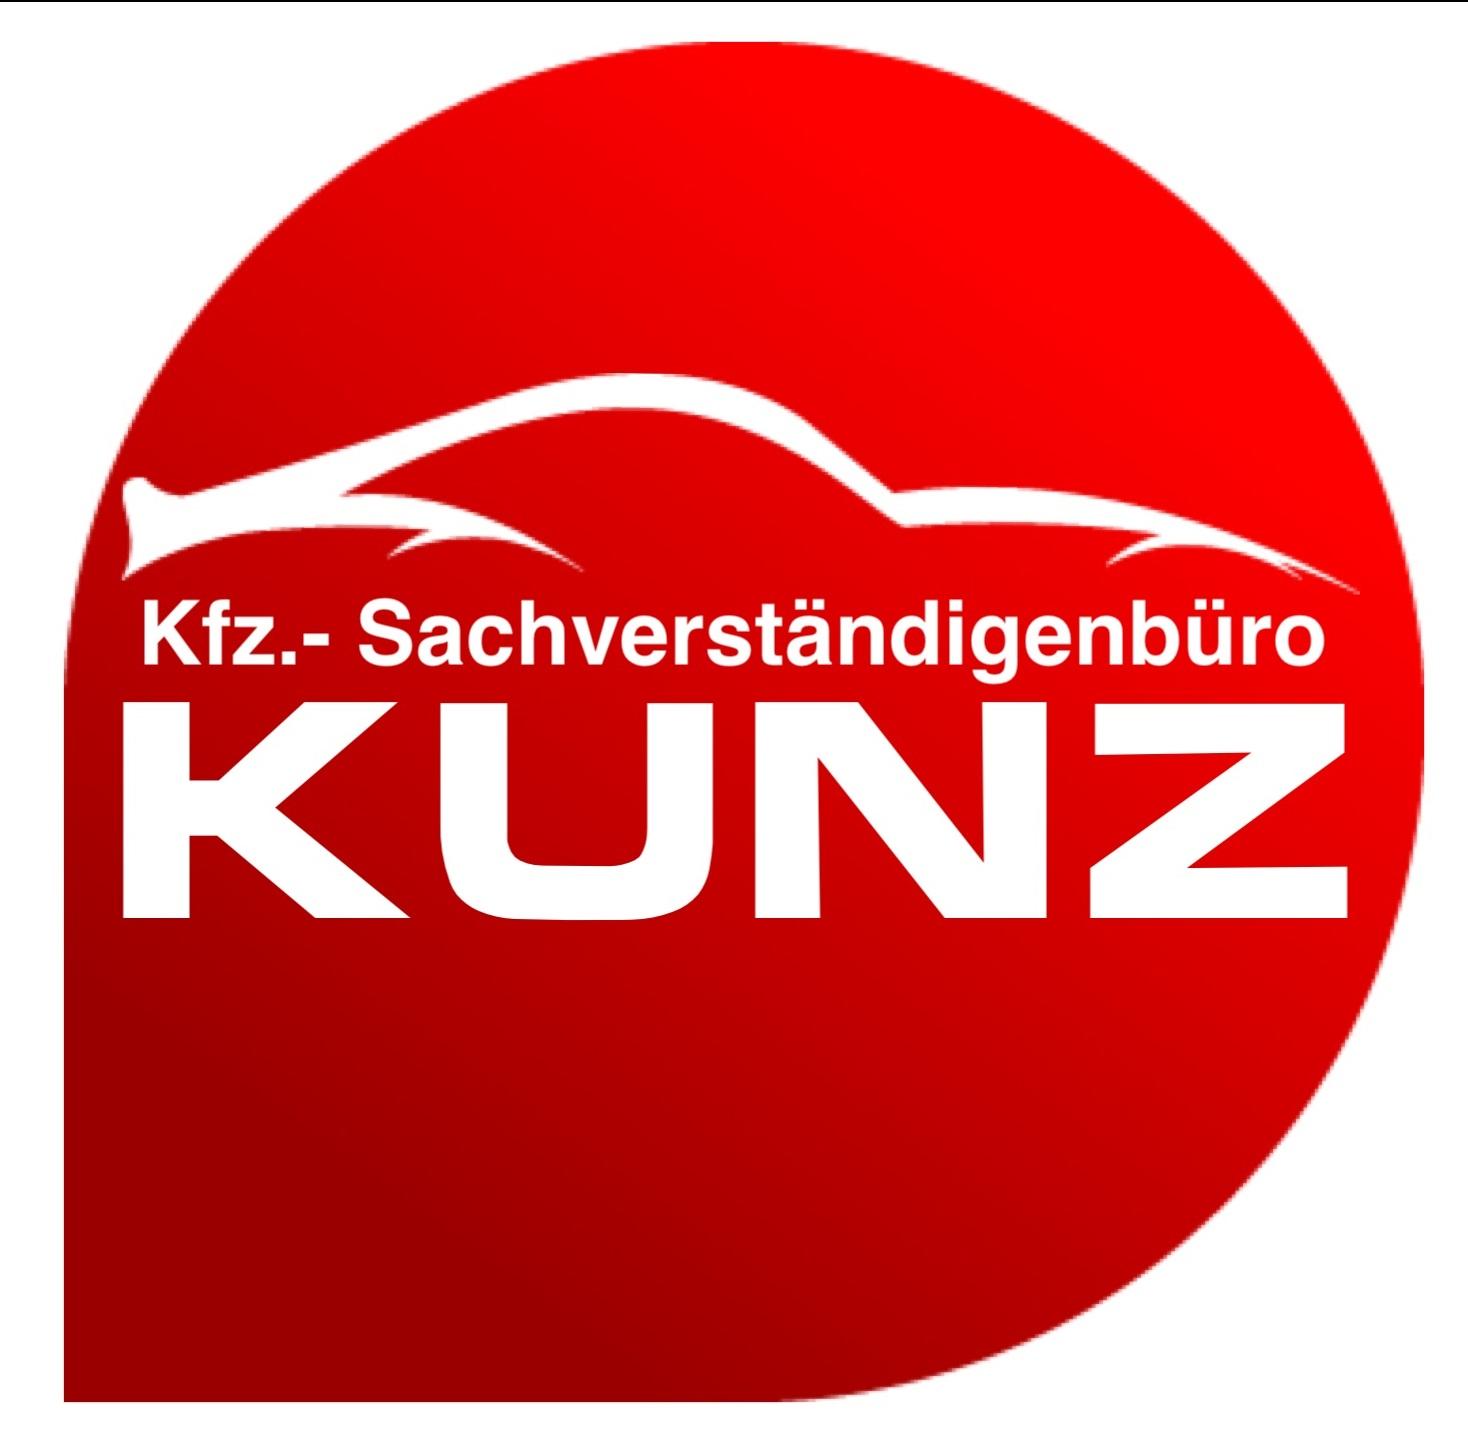 Kfz.- Sachverständigenbüro Kunz